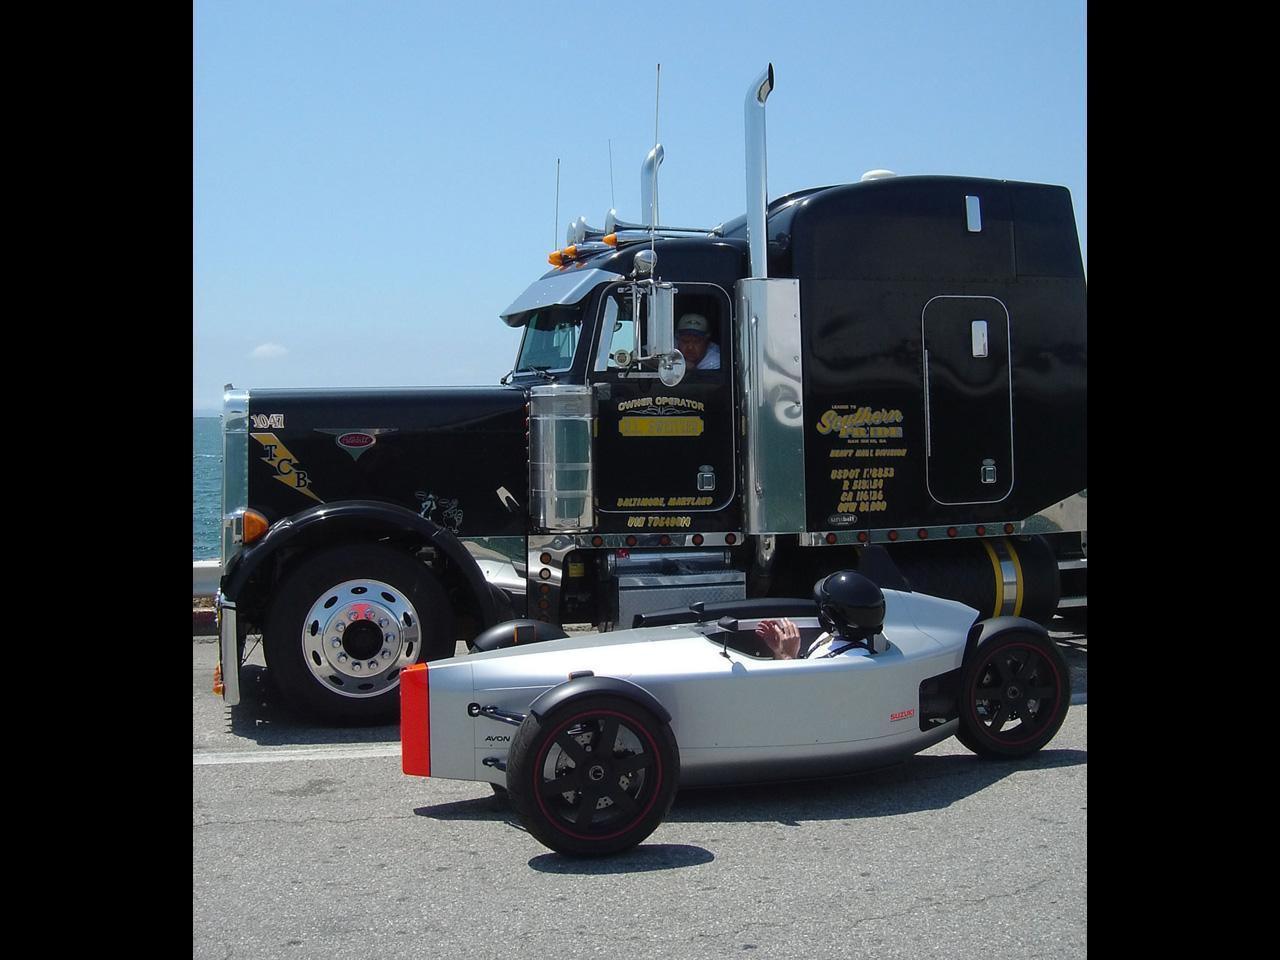 Tractor Trailer Wallpaper 2008 Sub g1 Tractor Trailer 1280x960